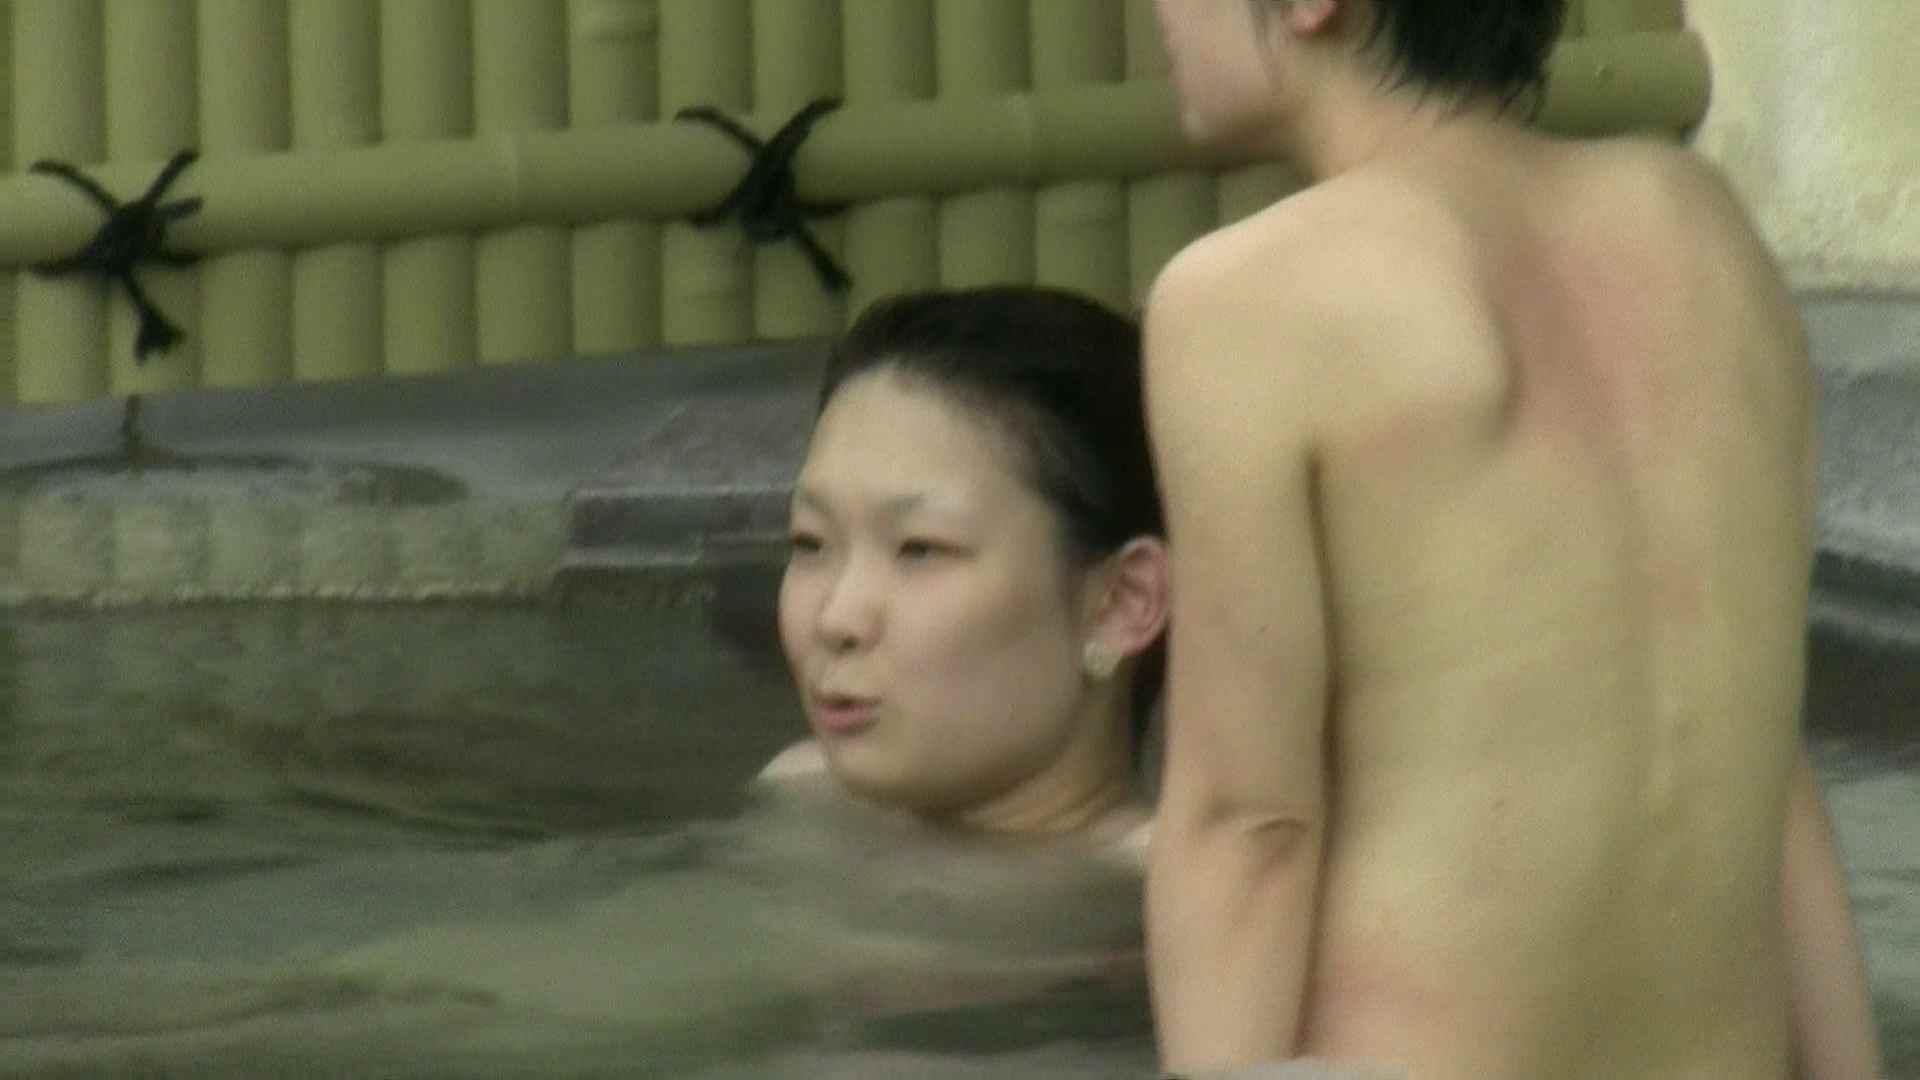 Aquaな露天風呂Vol.670 露天 戯れ無修正画像 81連発 59